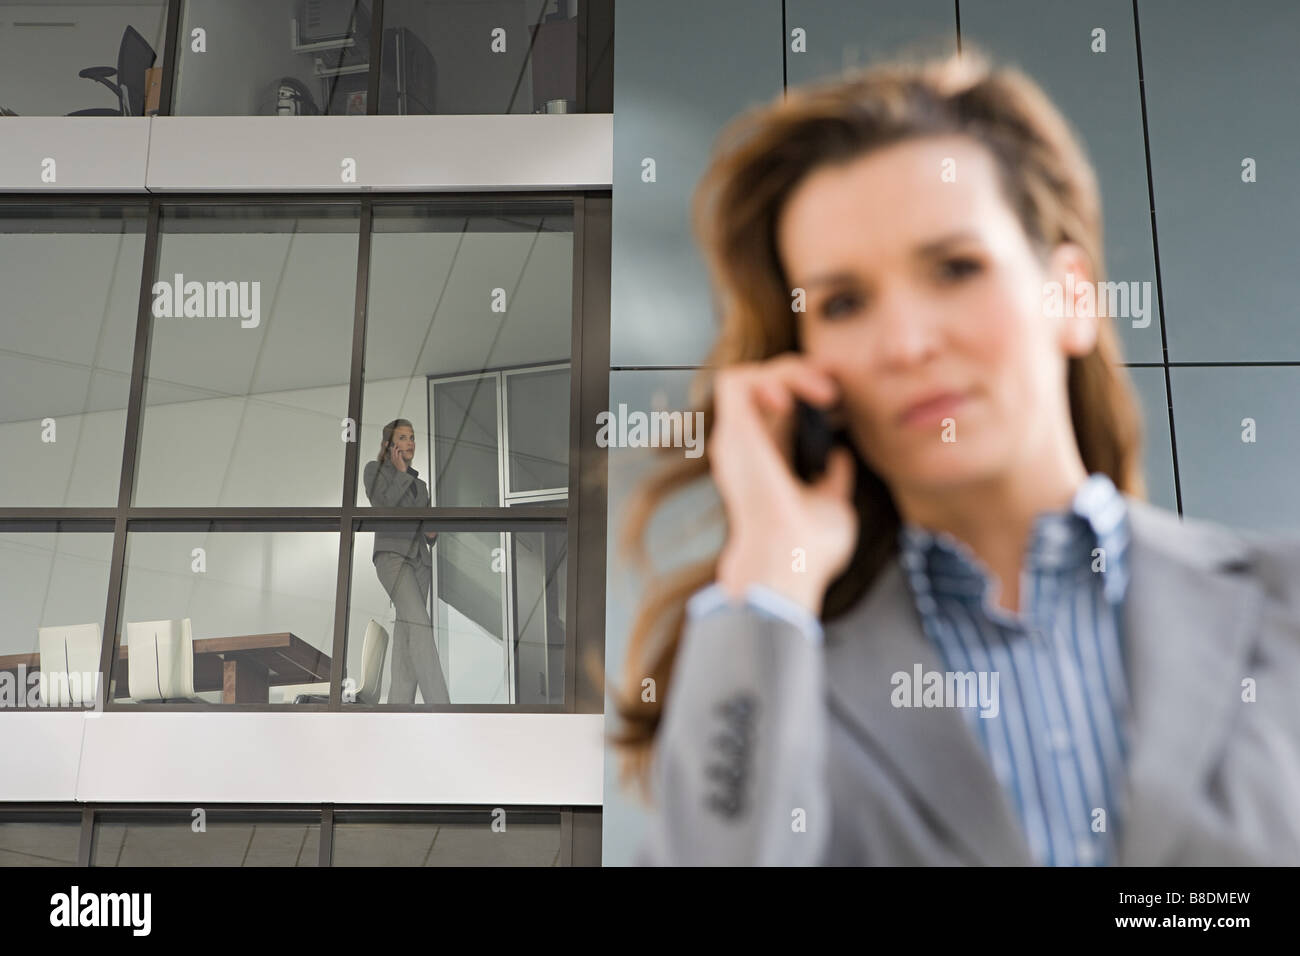 Businesswoman on cellphone Photo Stock